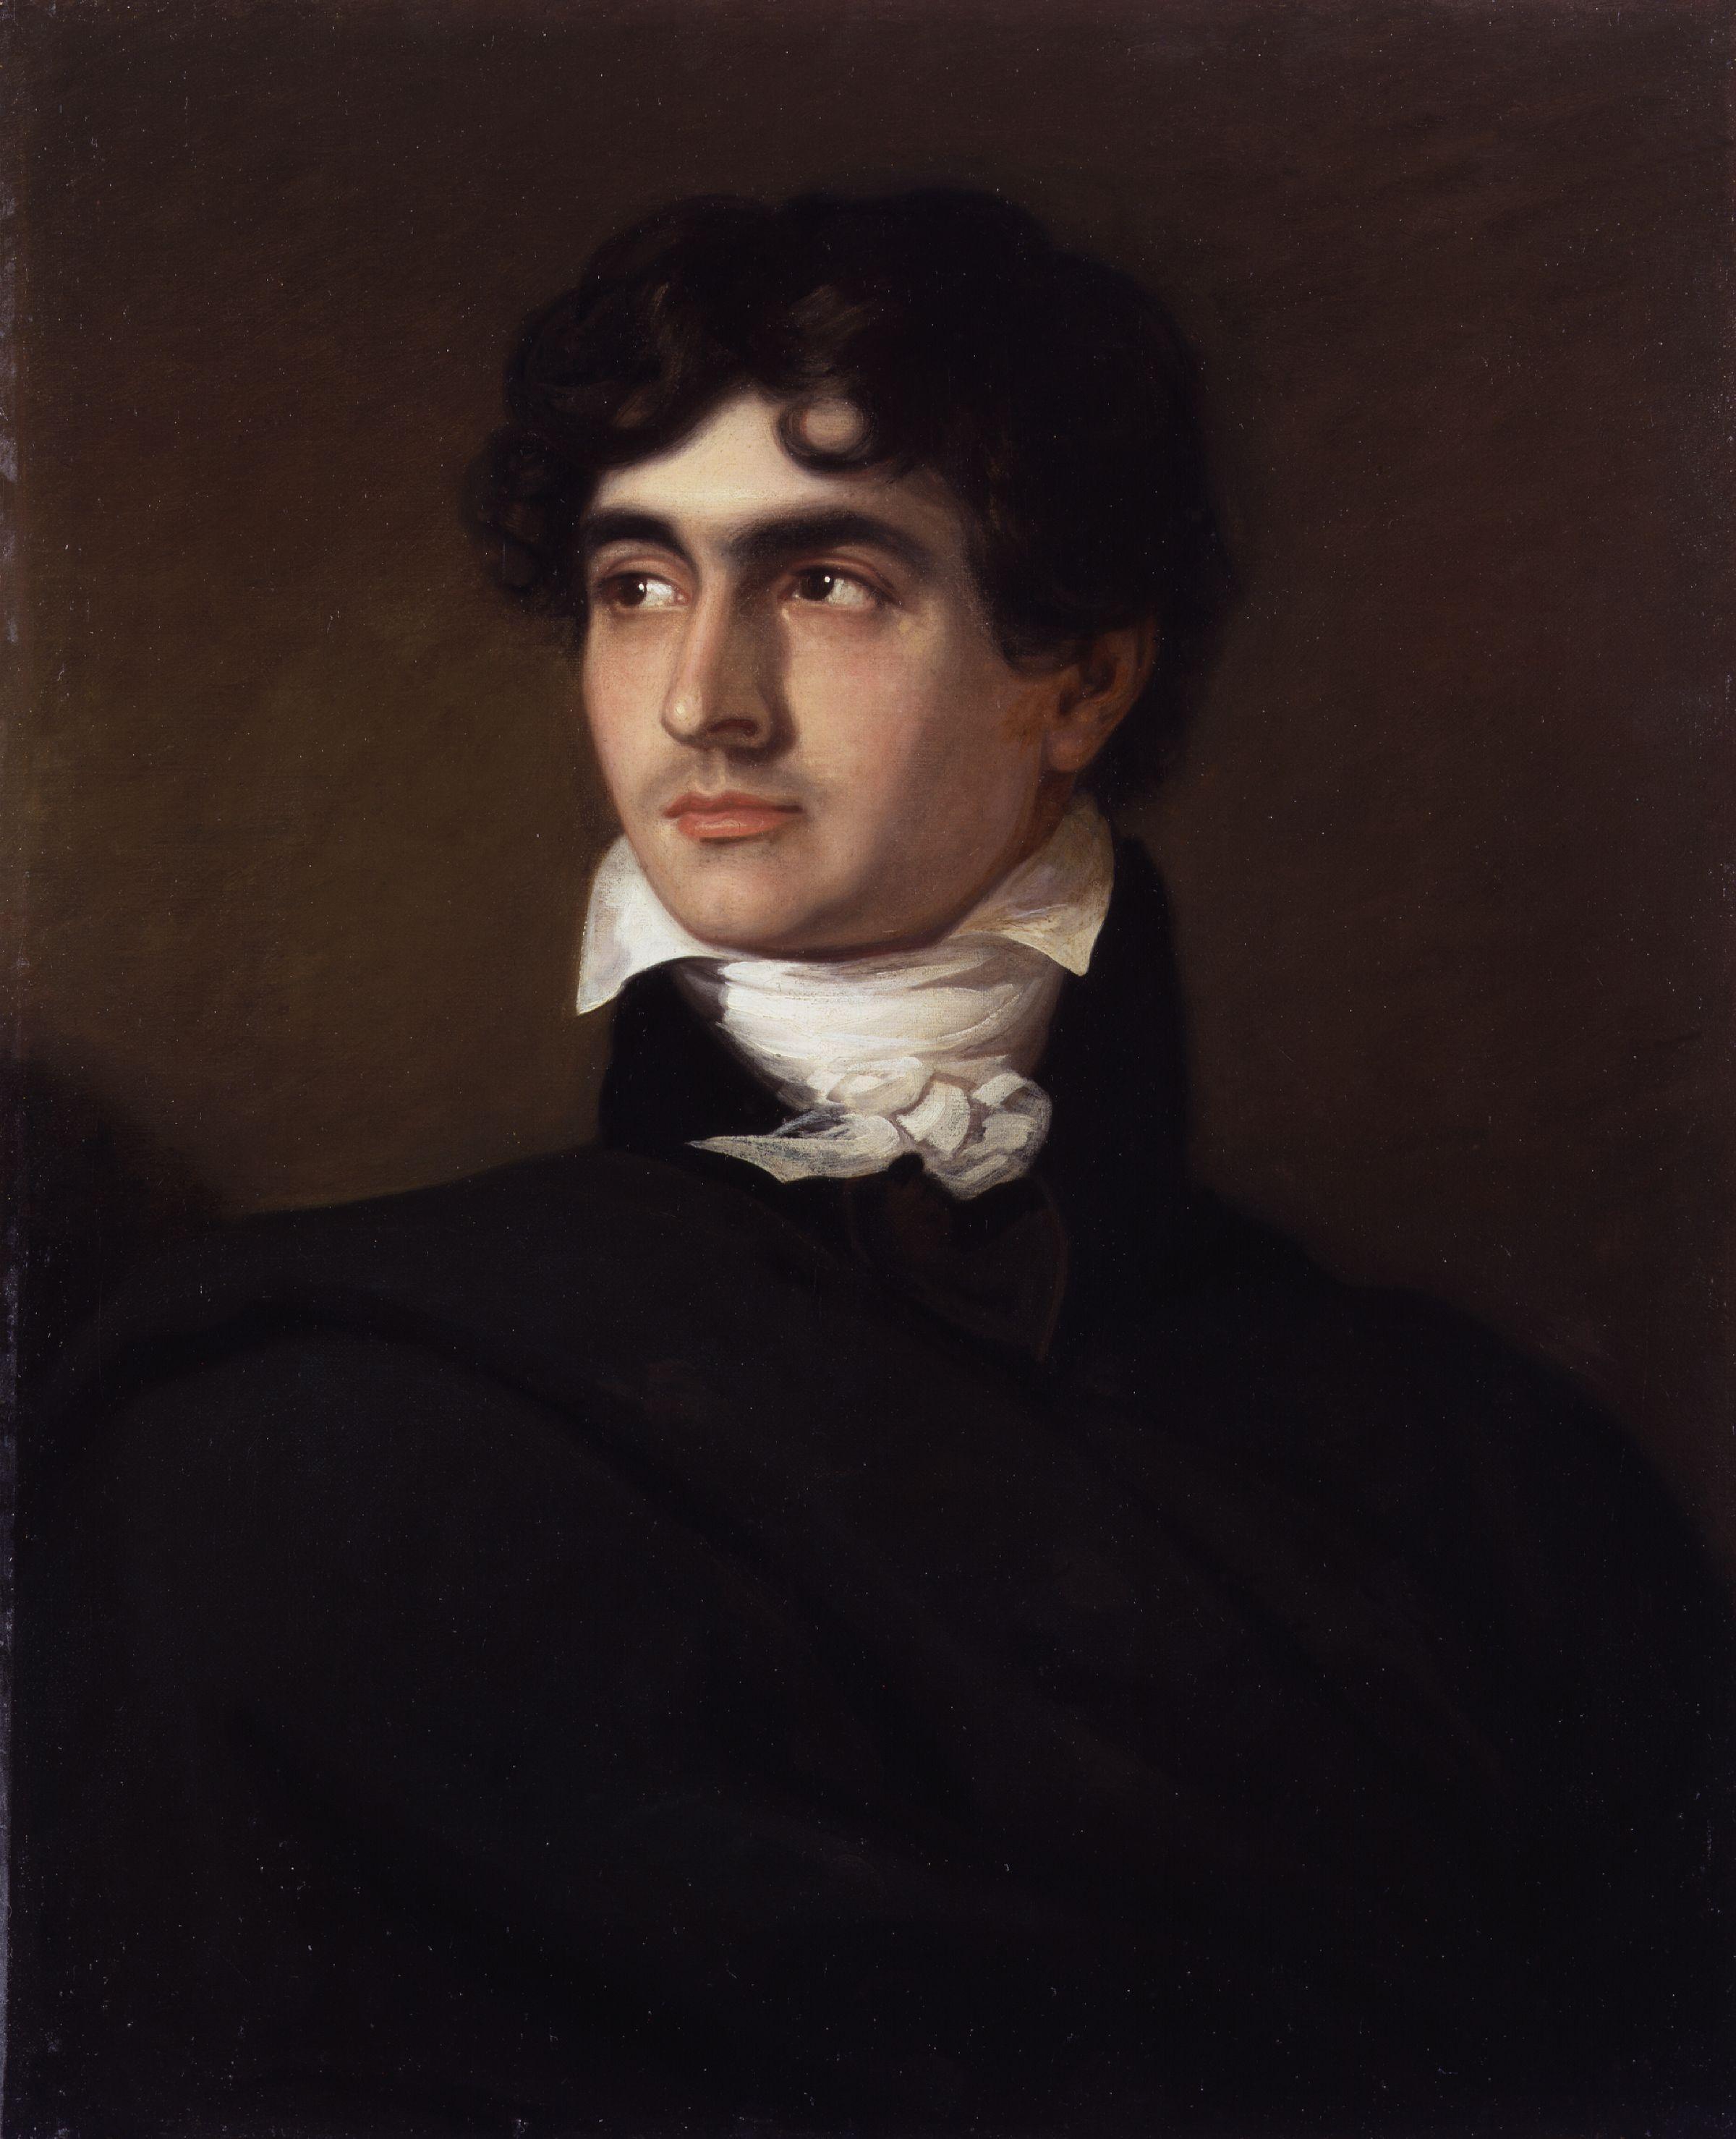 A picture of the author John William Polidori